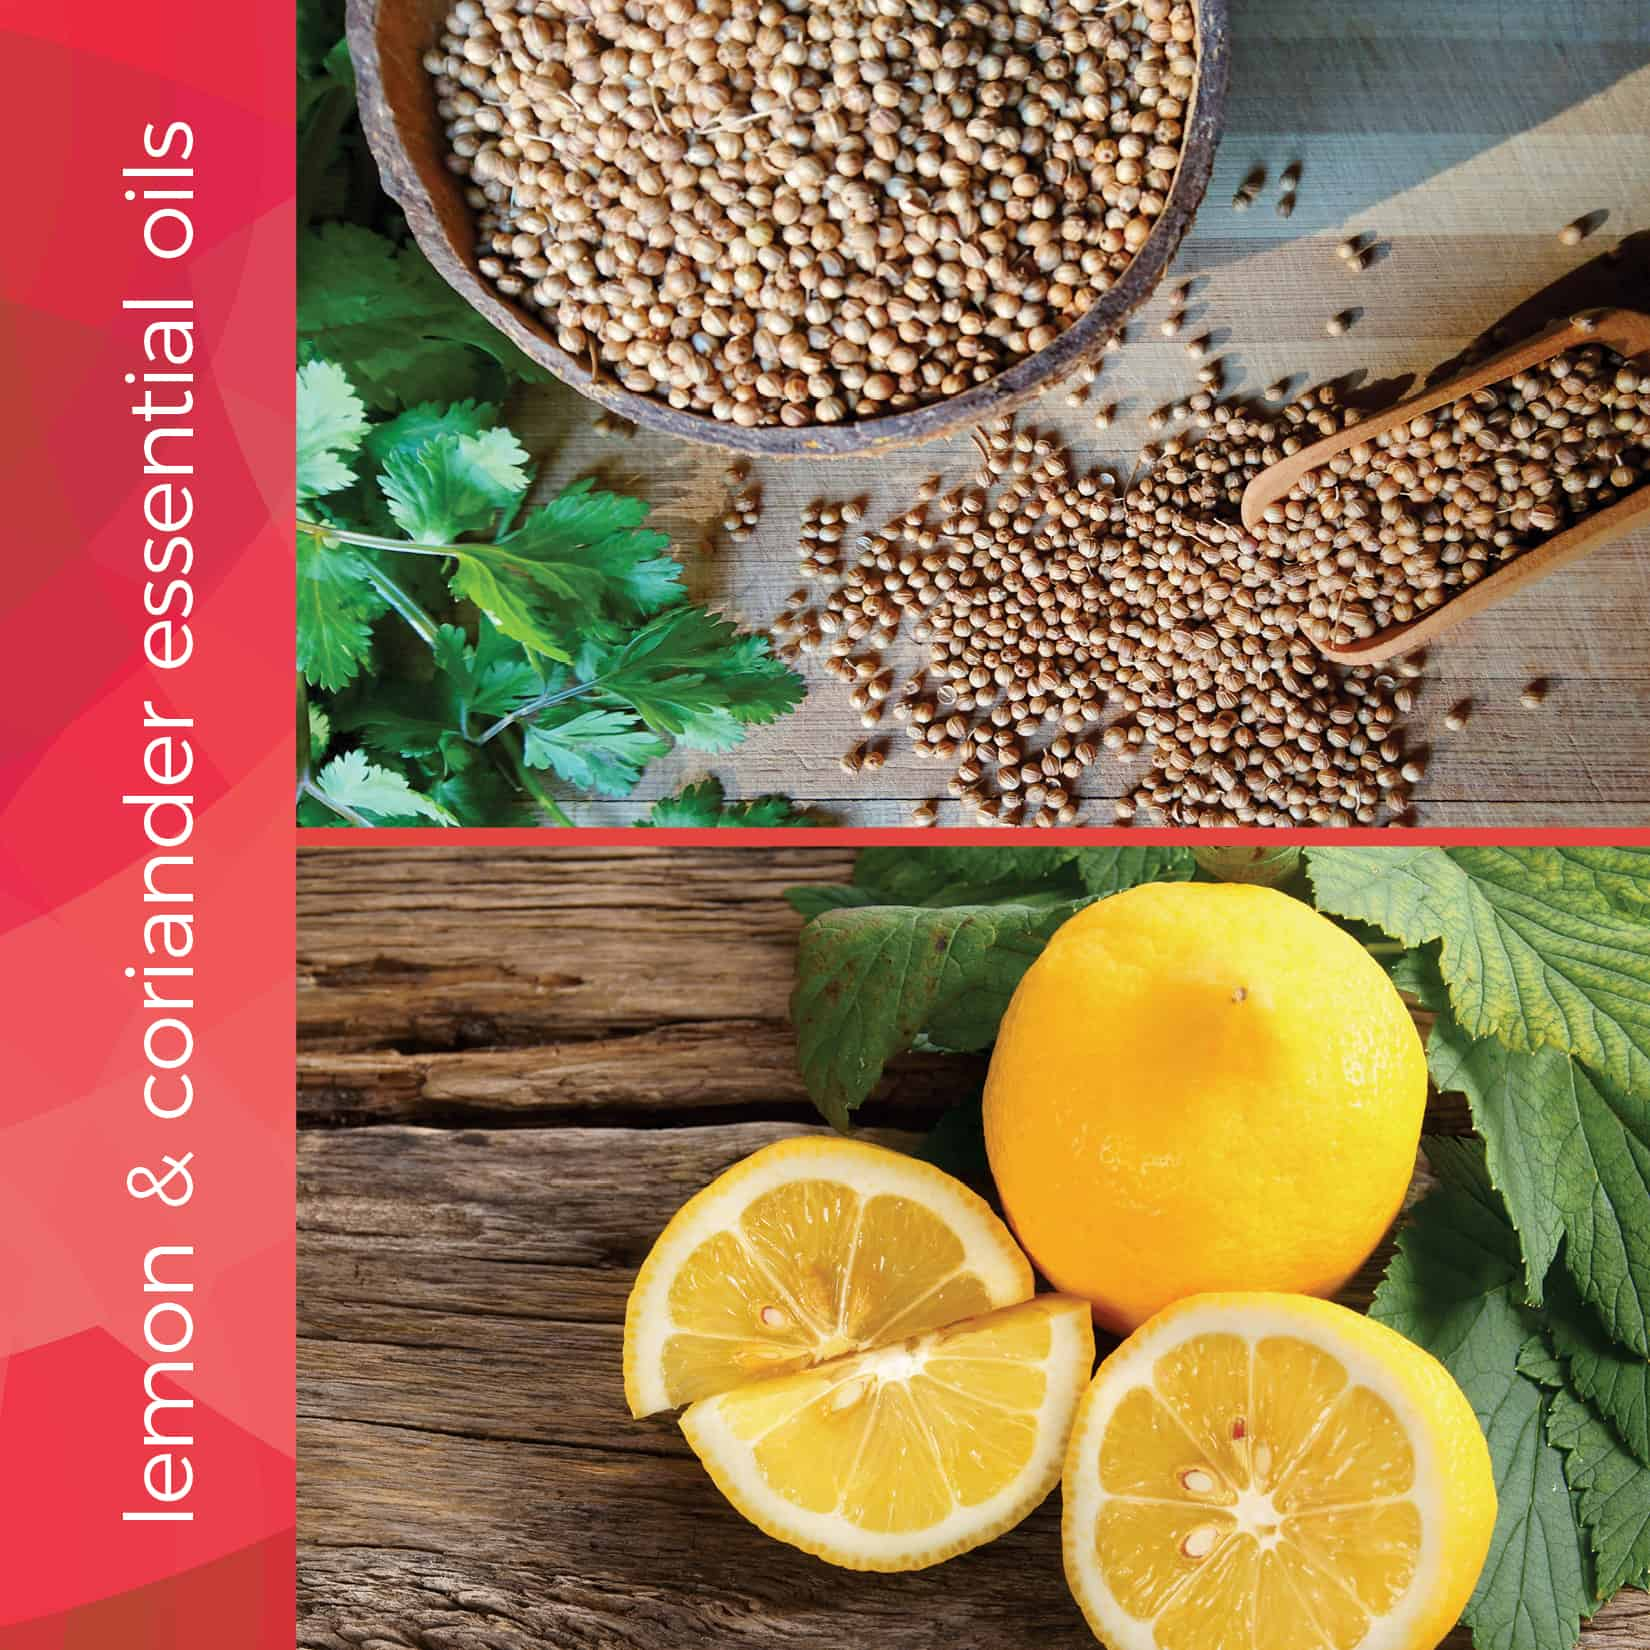 lemon and coriander